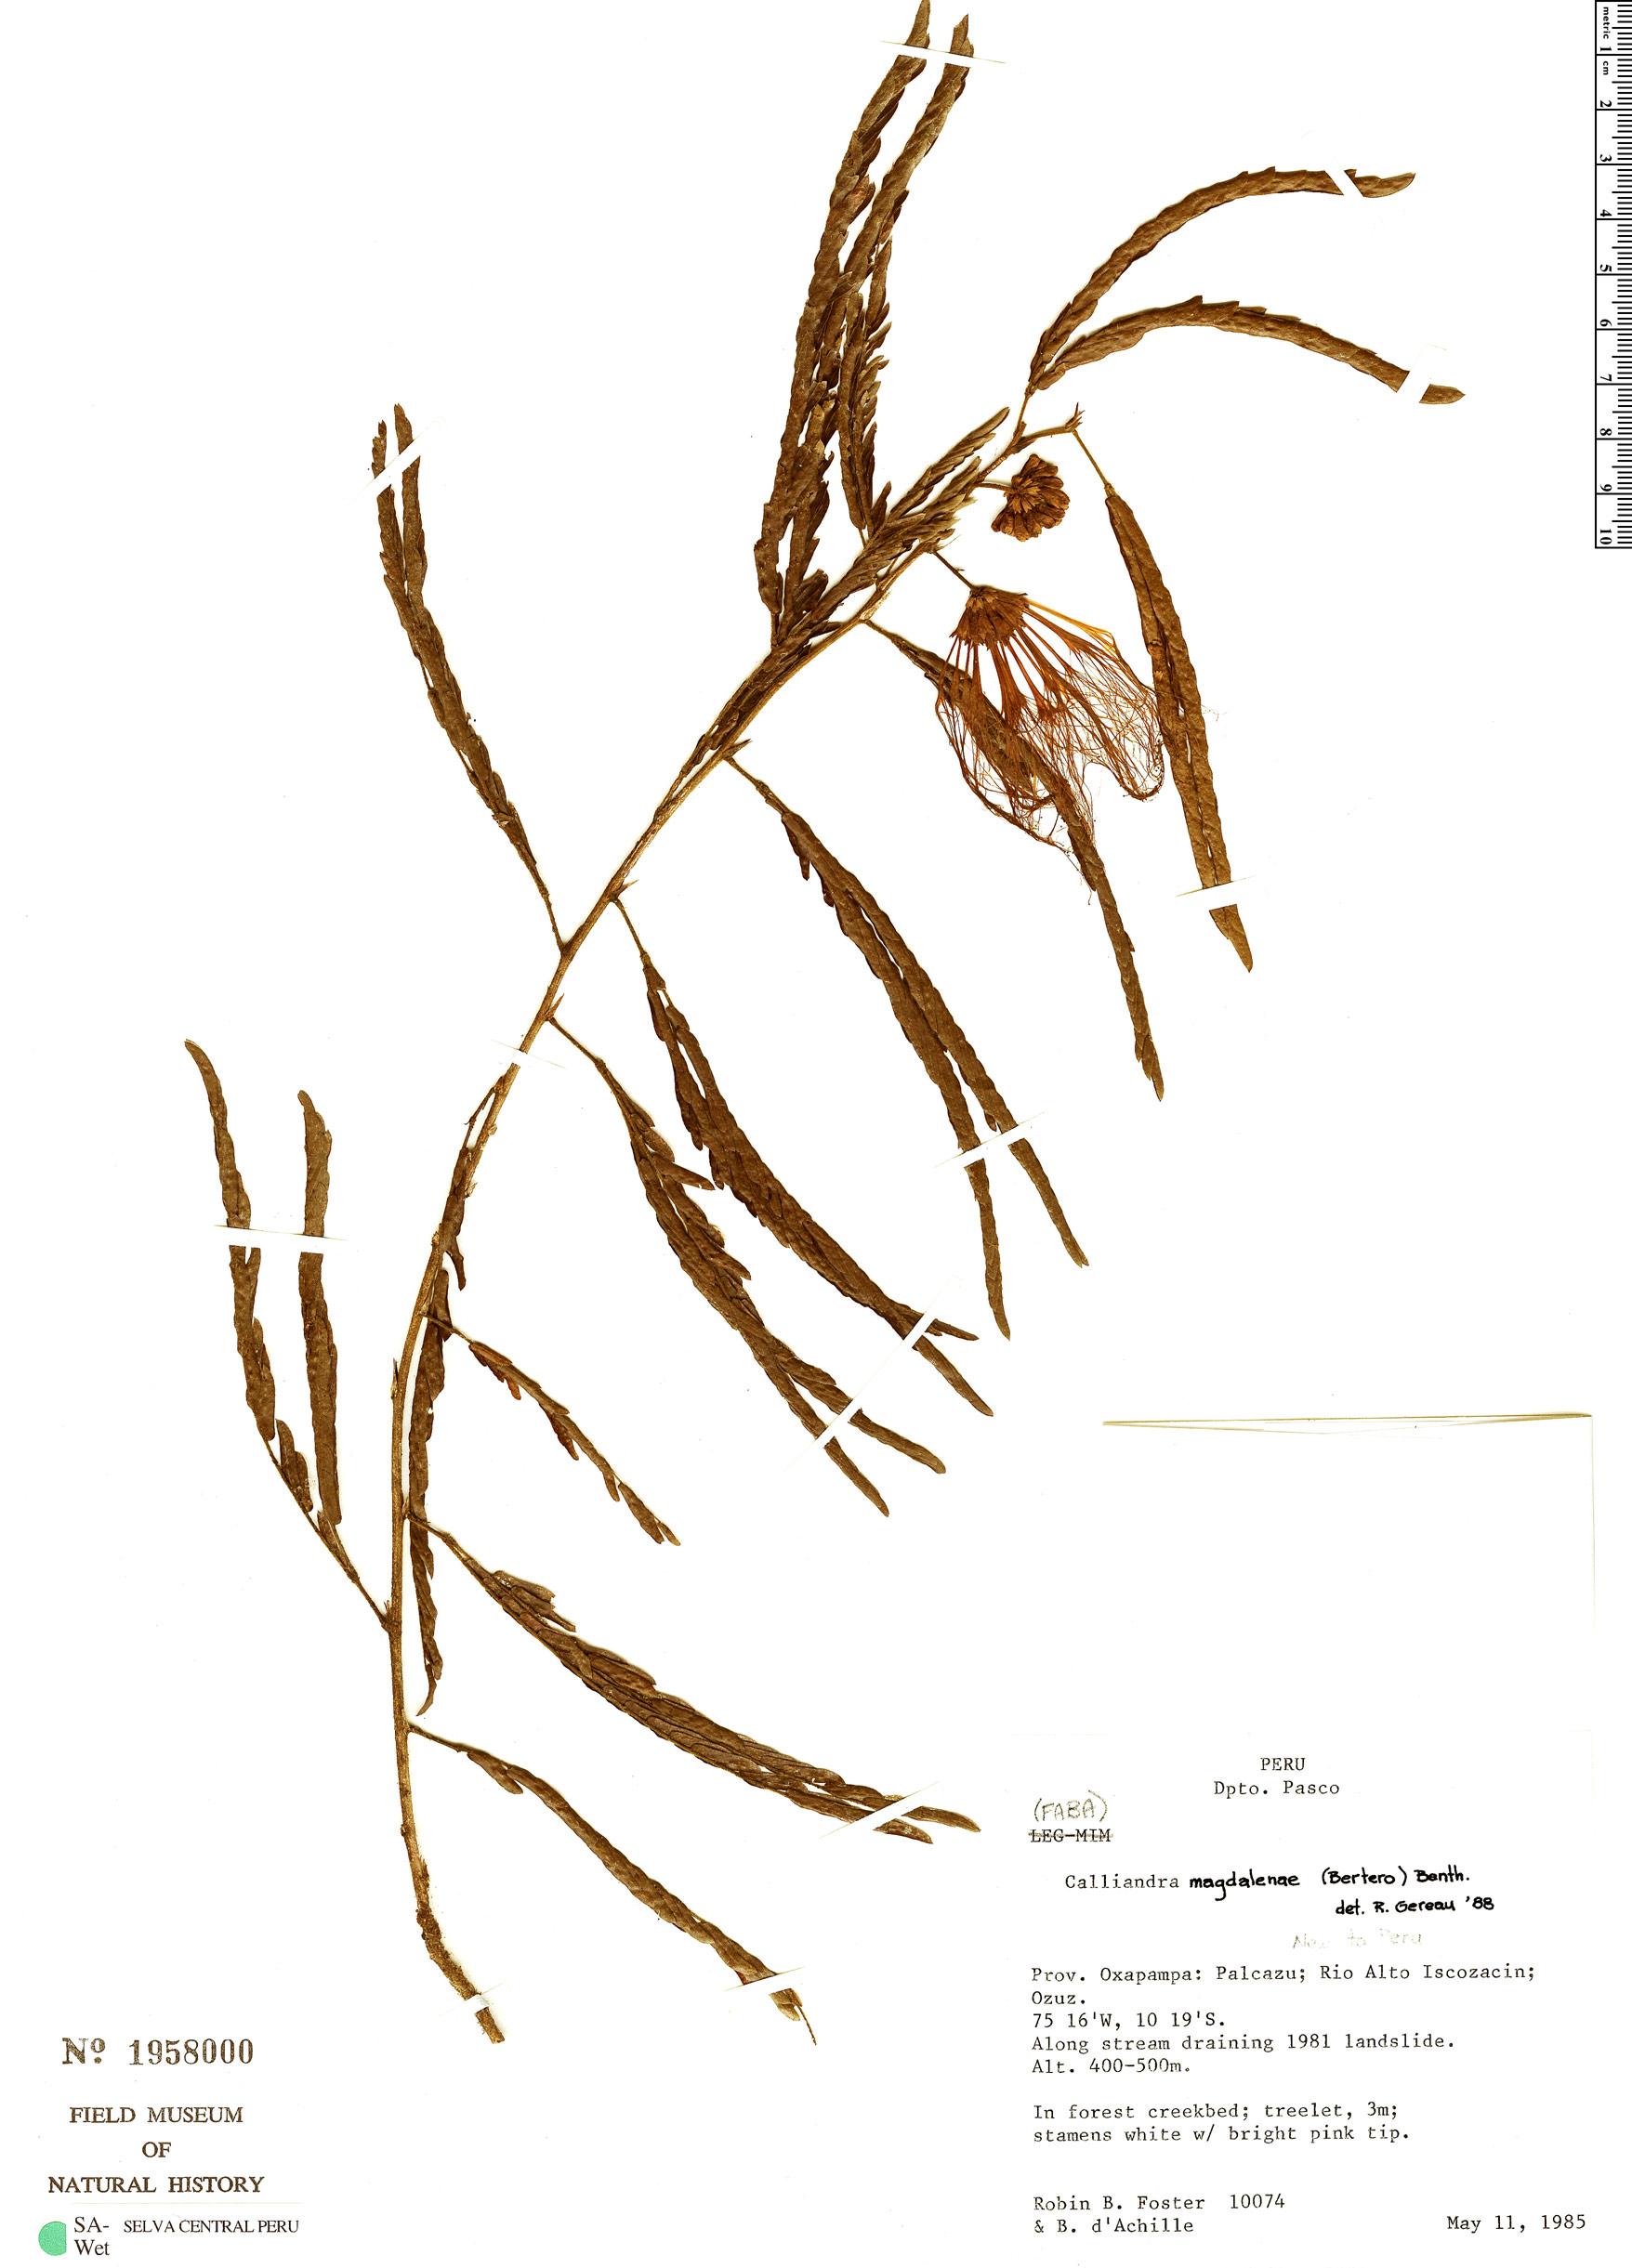 Specimen: Calliandra magdalenae